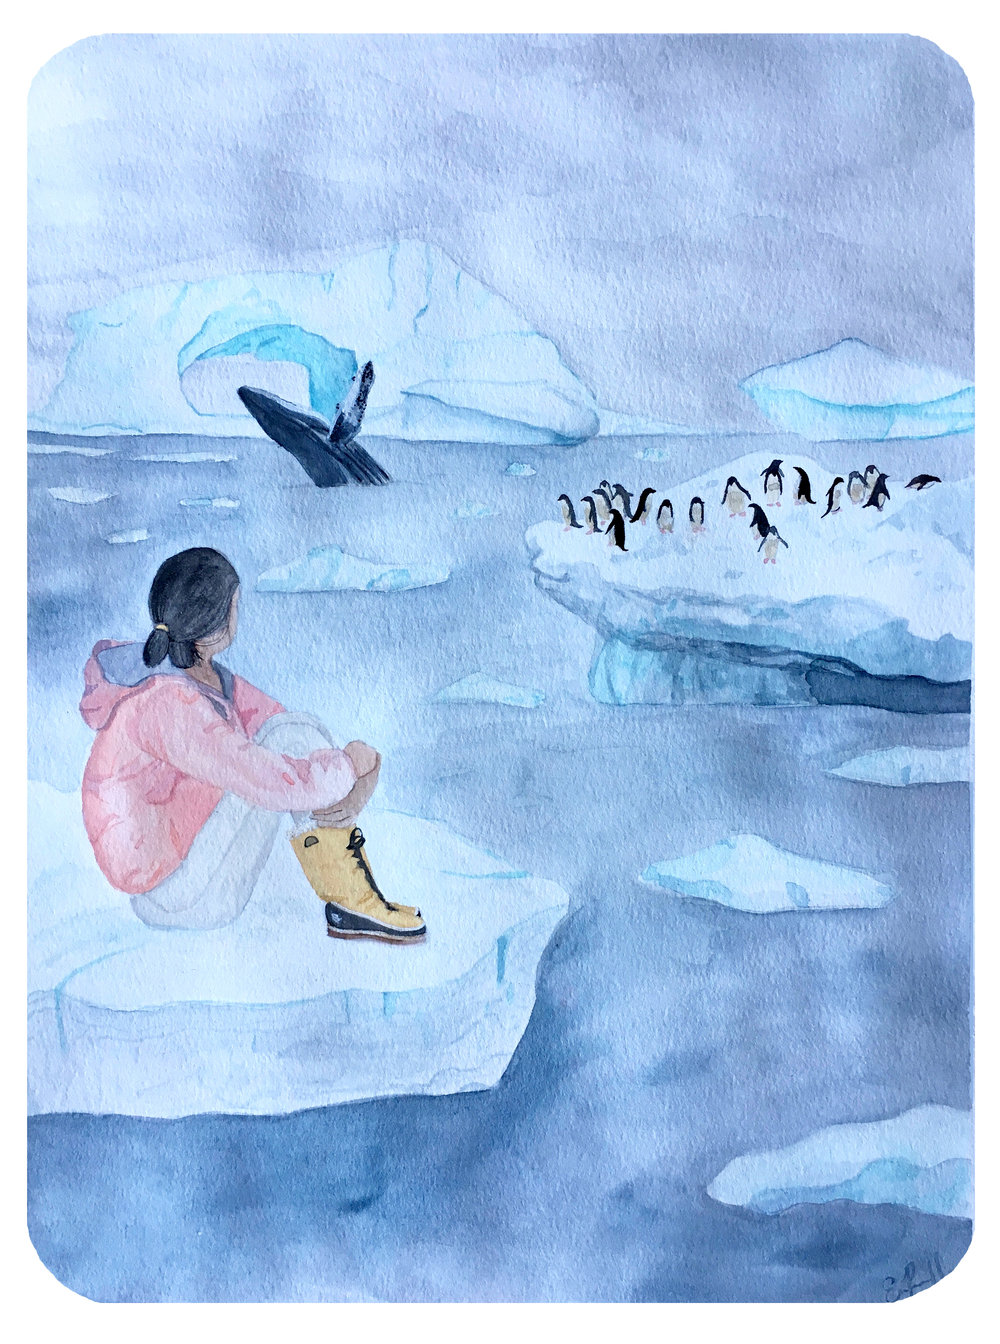 Antarctica_Elle Powell Art.jpg